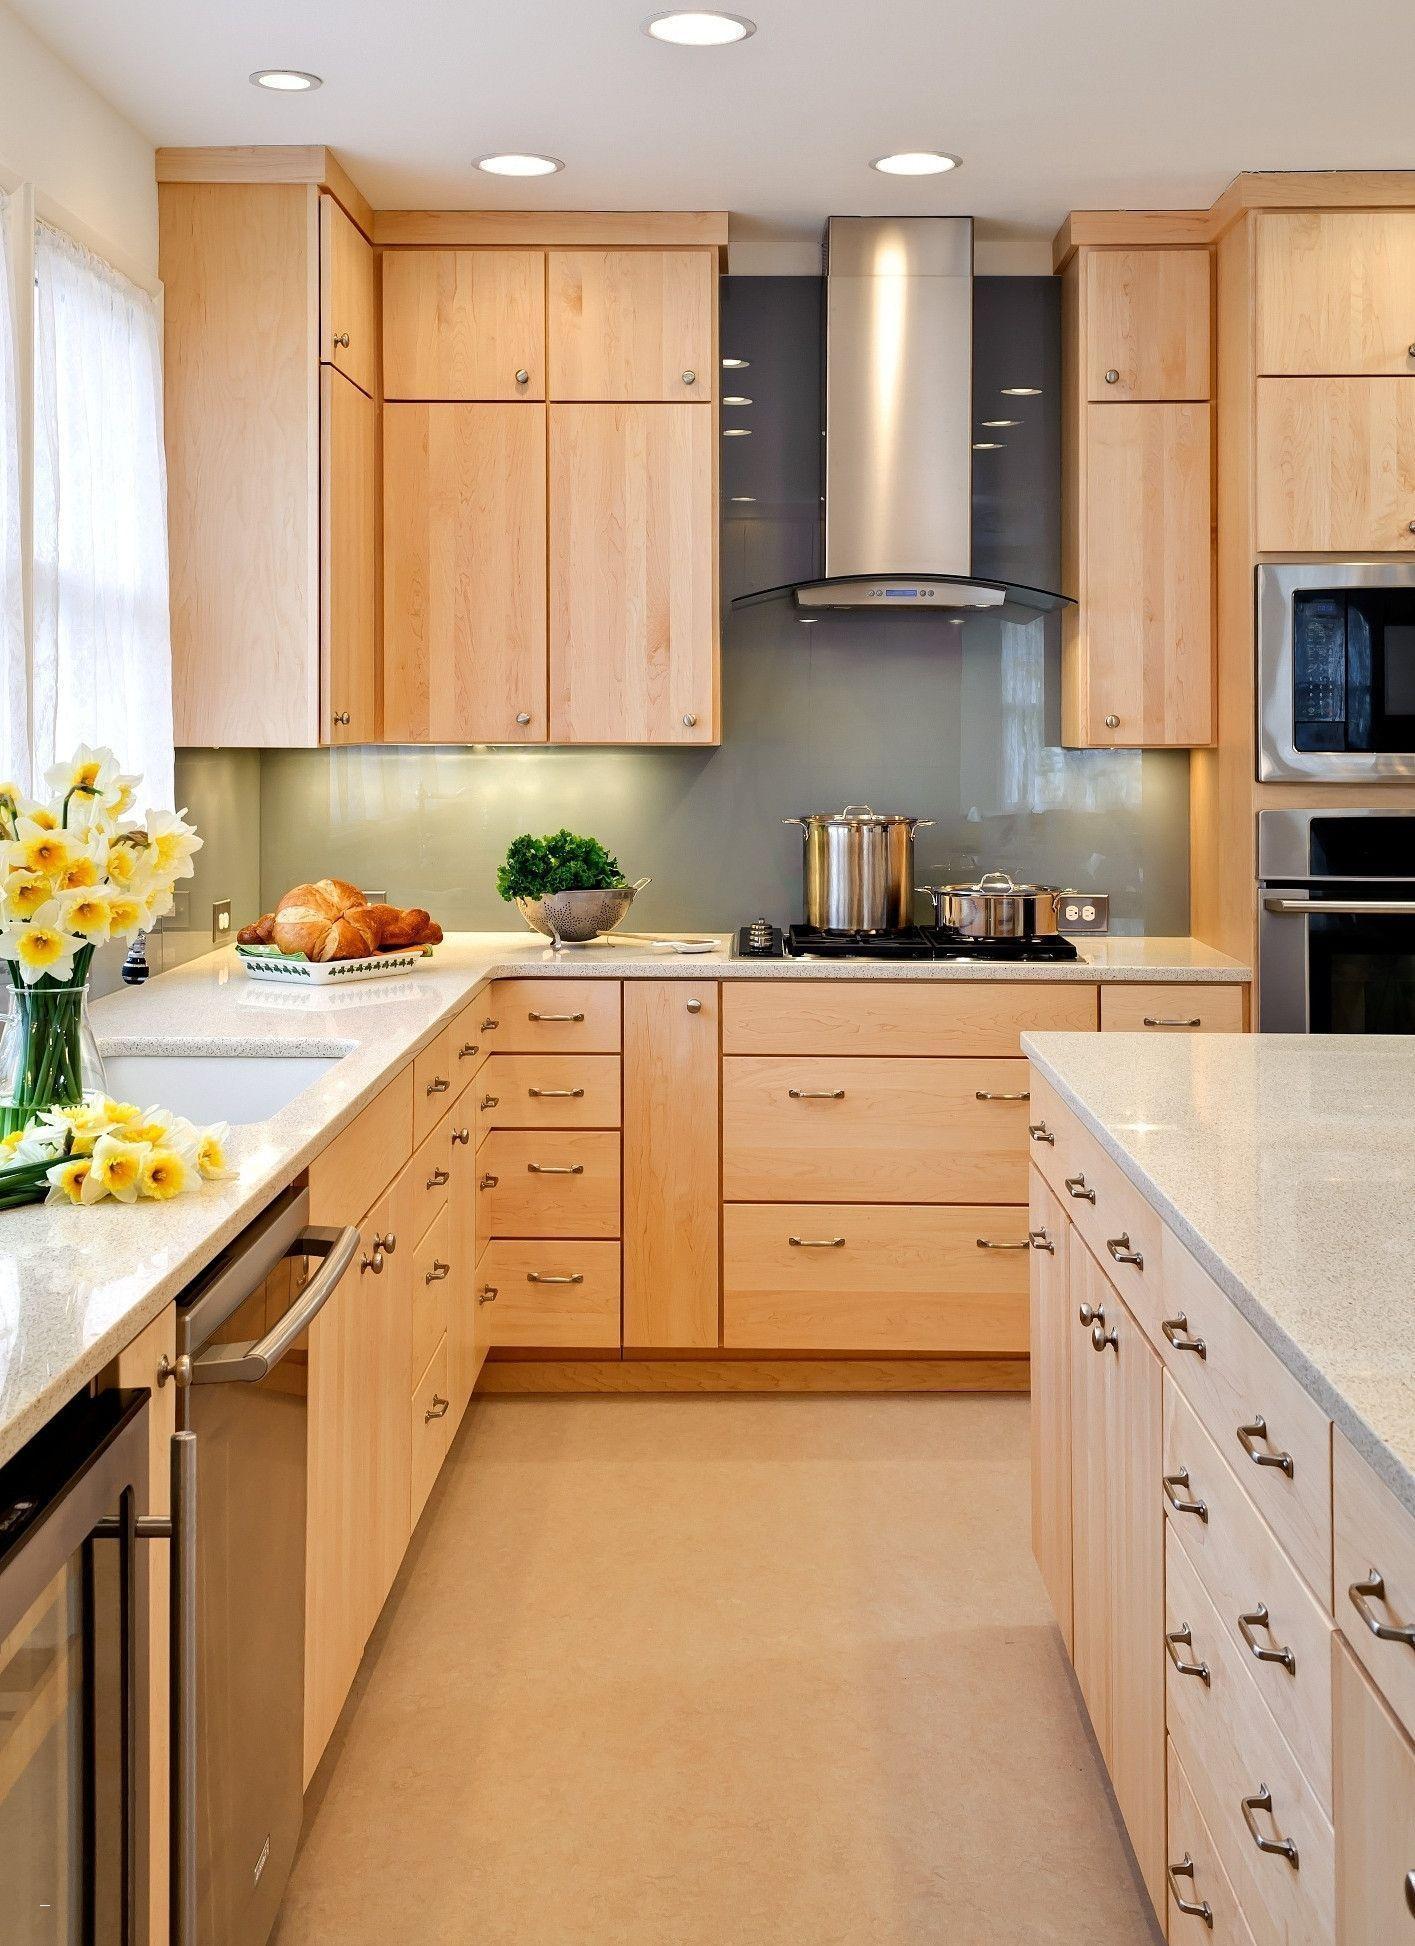 Kitchen Cabinets And Countertops Maple Kitchen Cabinets Modern Kitchen Cabinets In 2020 Contemporary Wooden Kitchen Wooden Kitchen Cabinets Modern Maple Kitchen